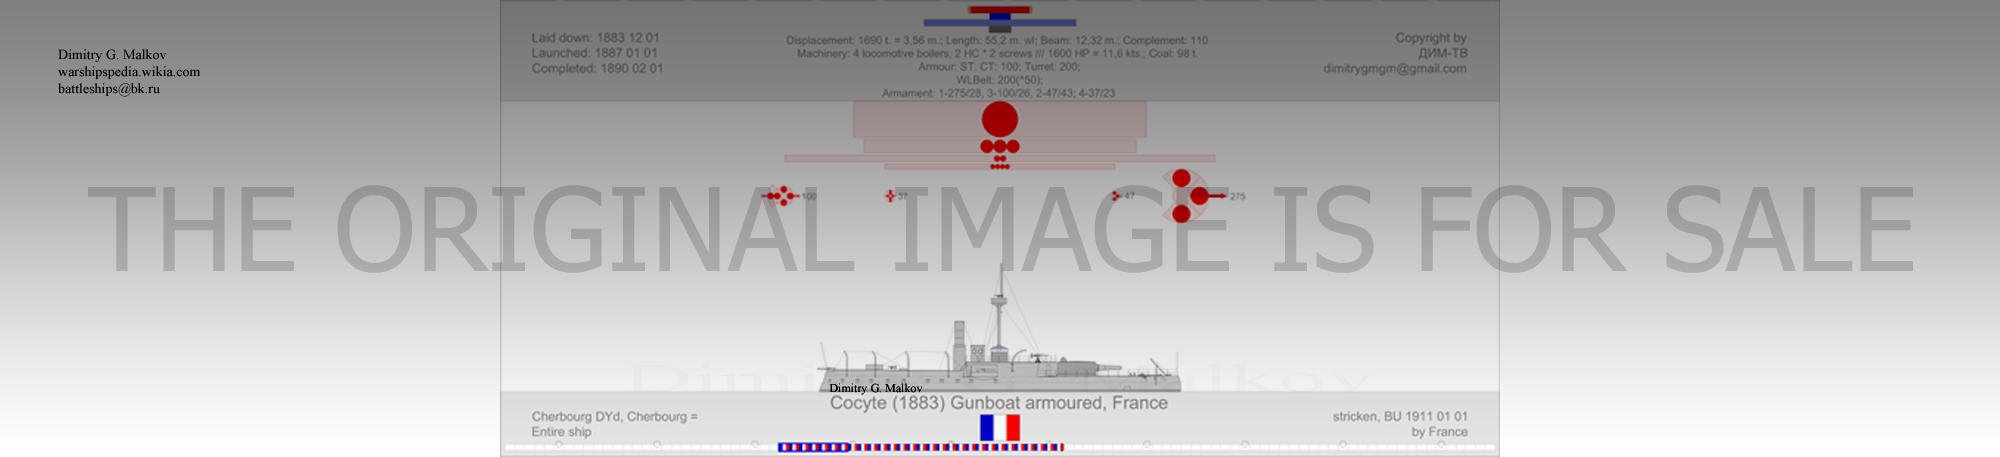 Mes dessins des navires francais - Page 9 Ga-18811